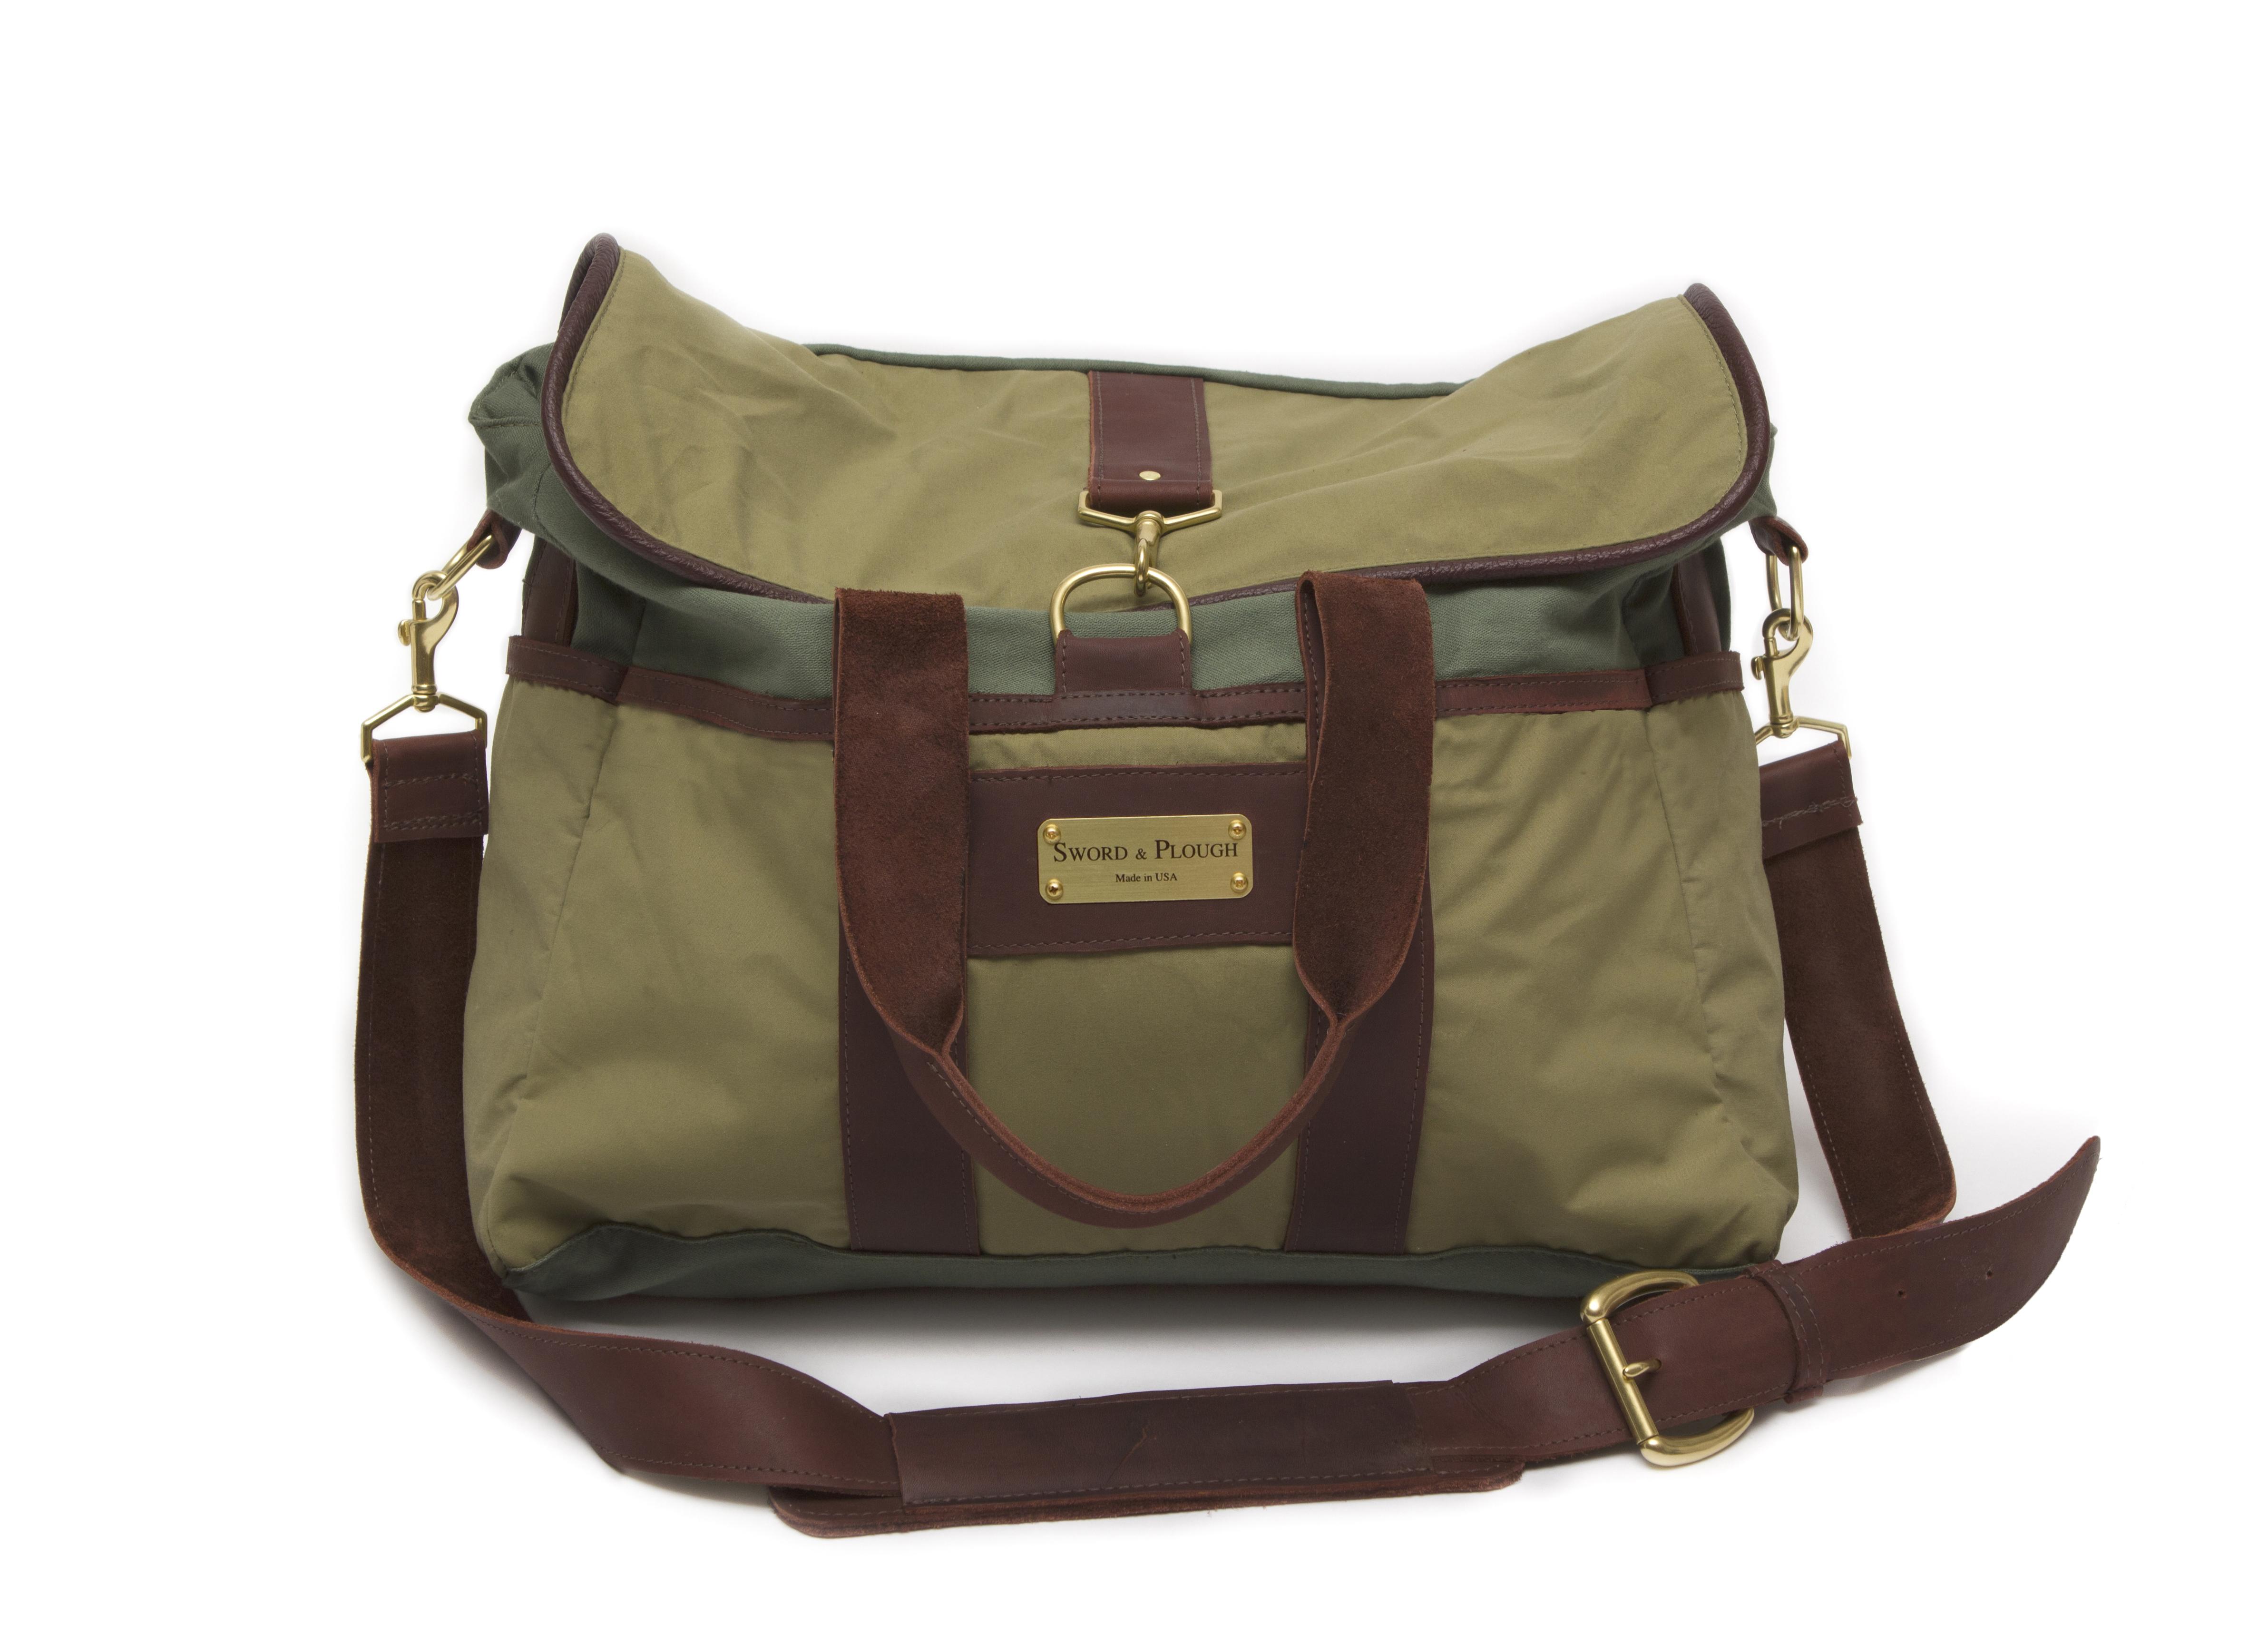 089be0b96b9b6 Green Messenger 1. Sword   Plough Signature Messenger Bag ...